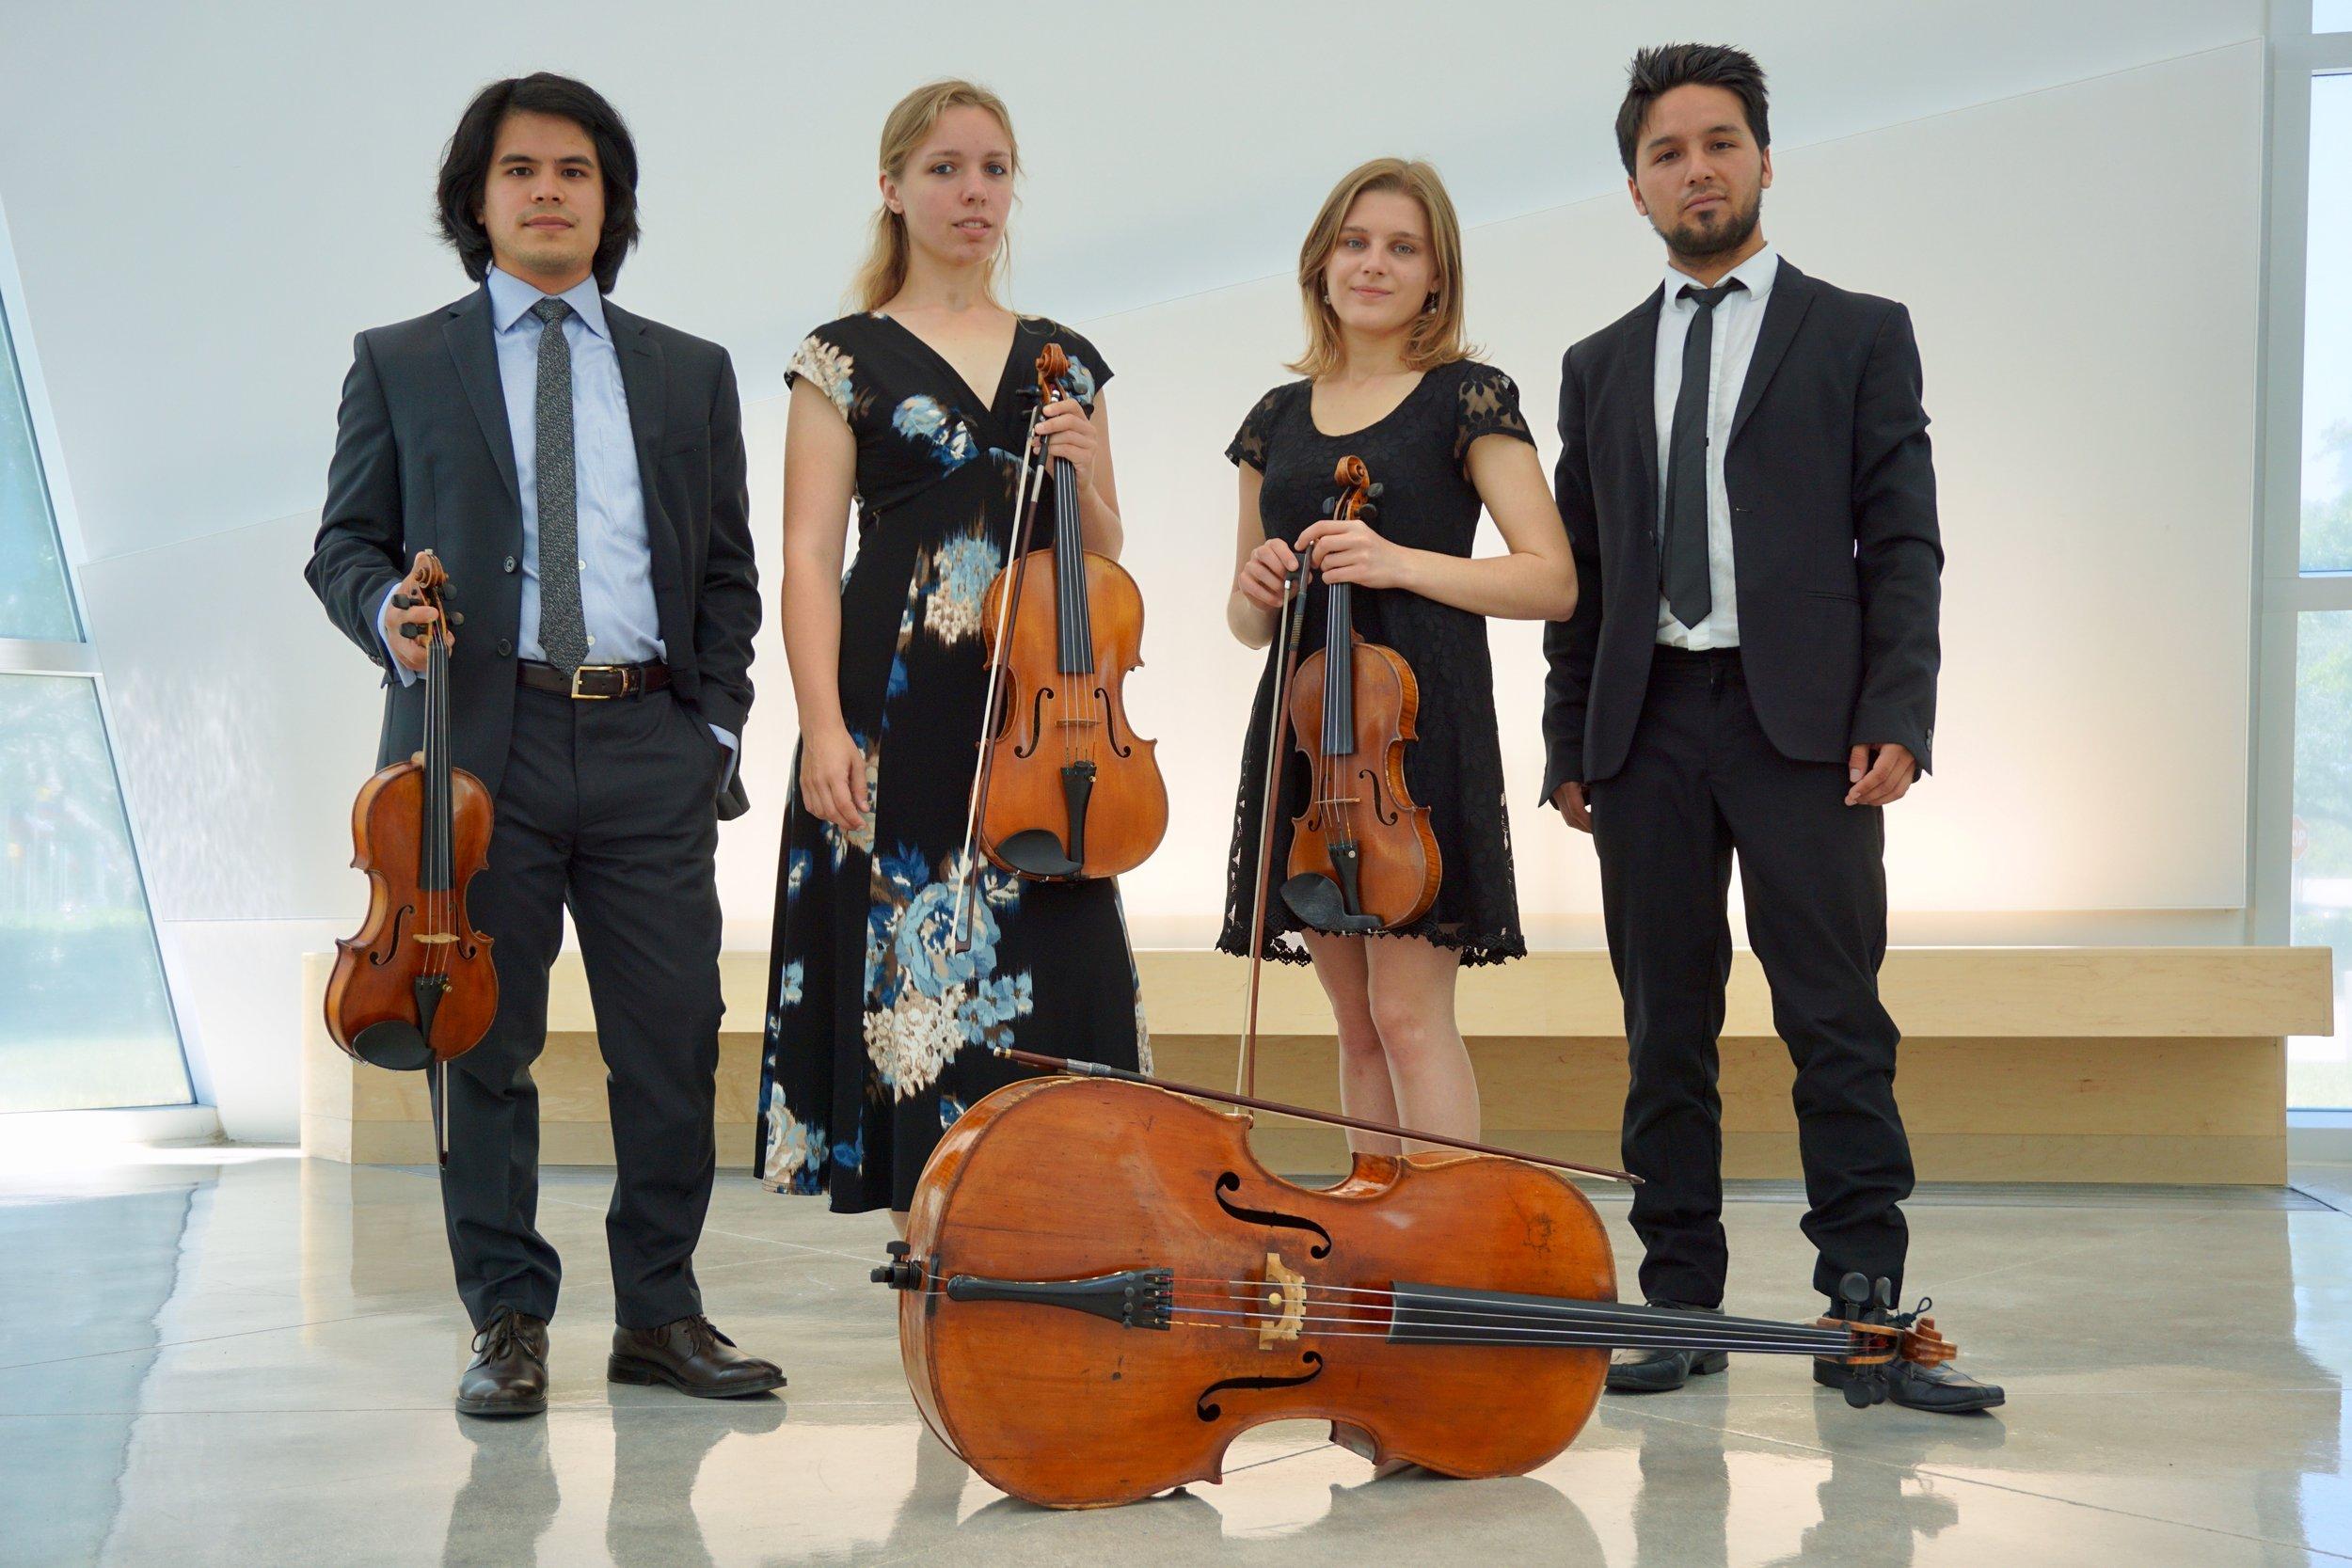 2017's Fellowship String Quartet - The Seacrest Quartet